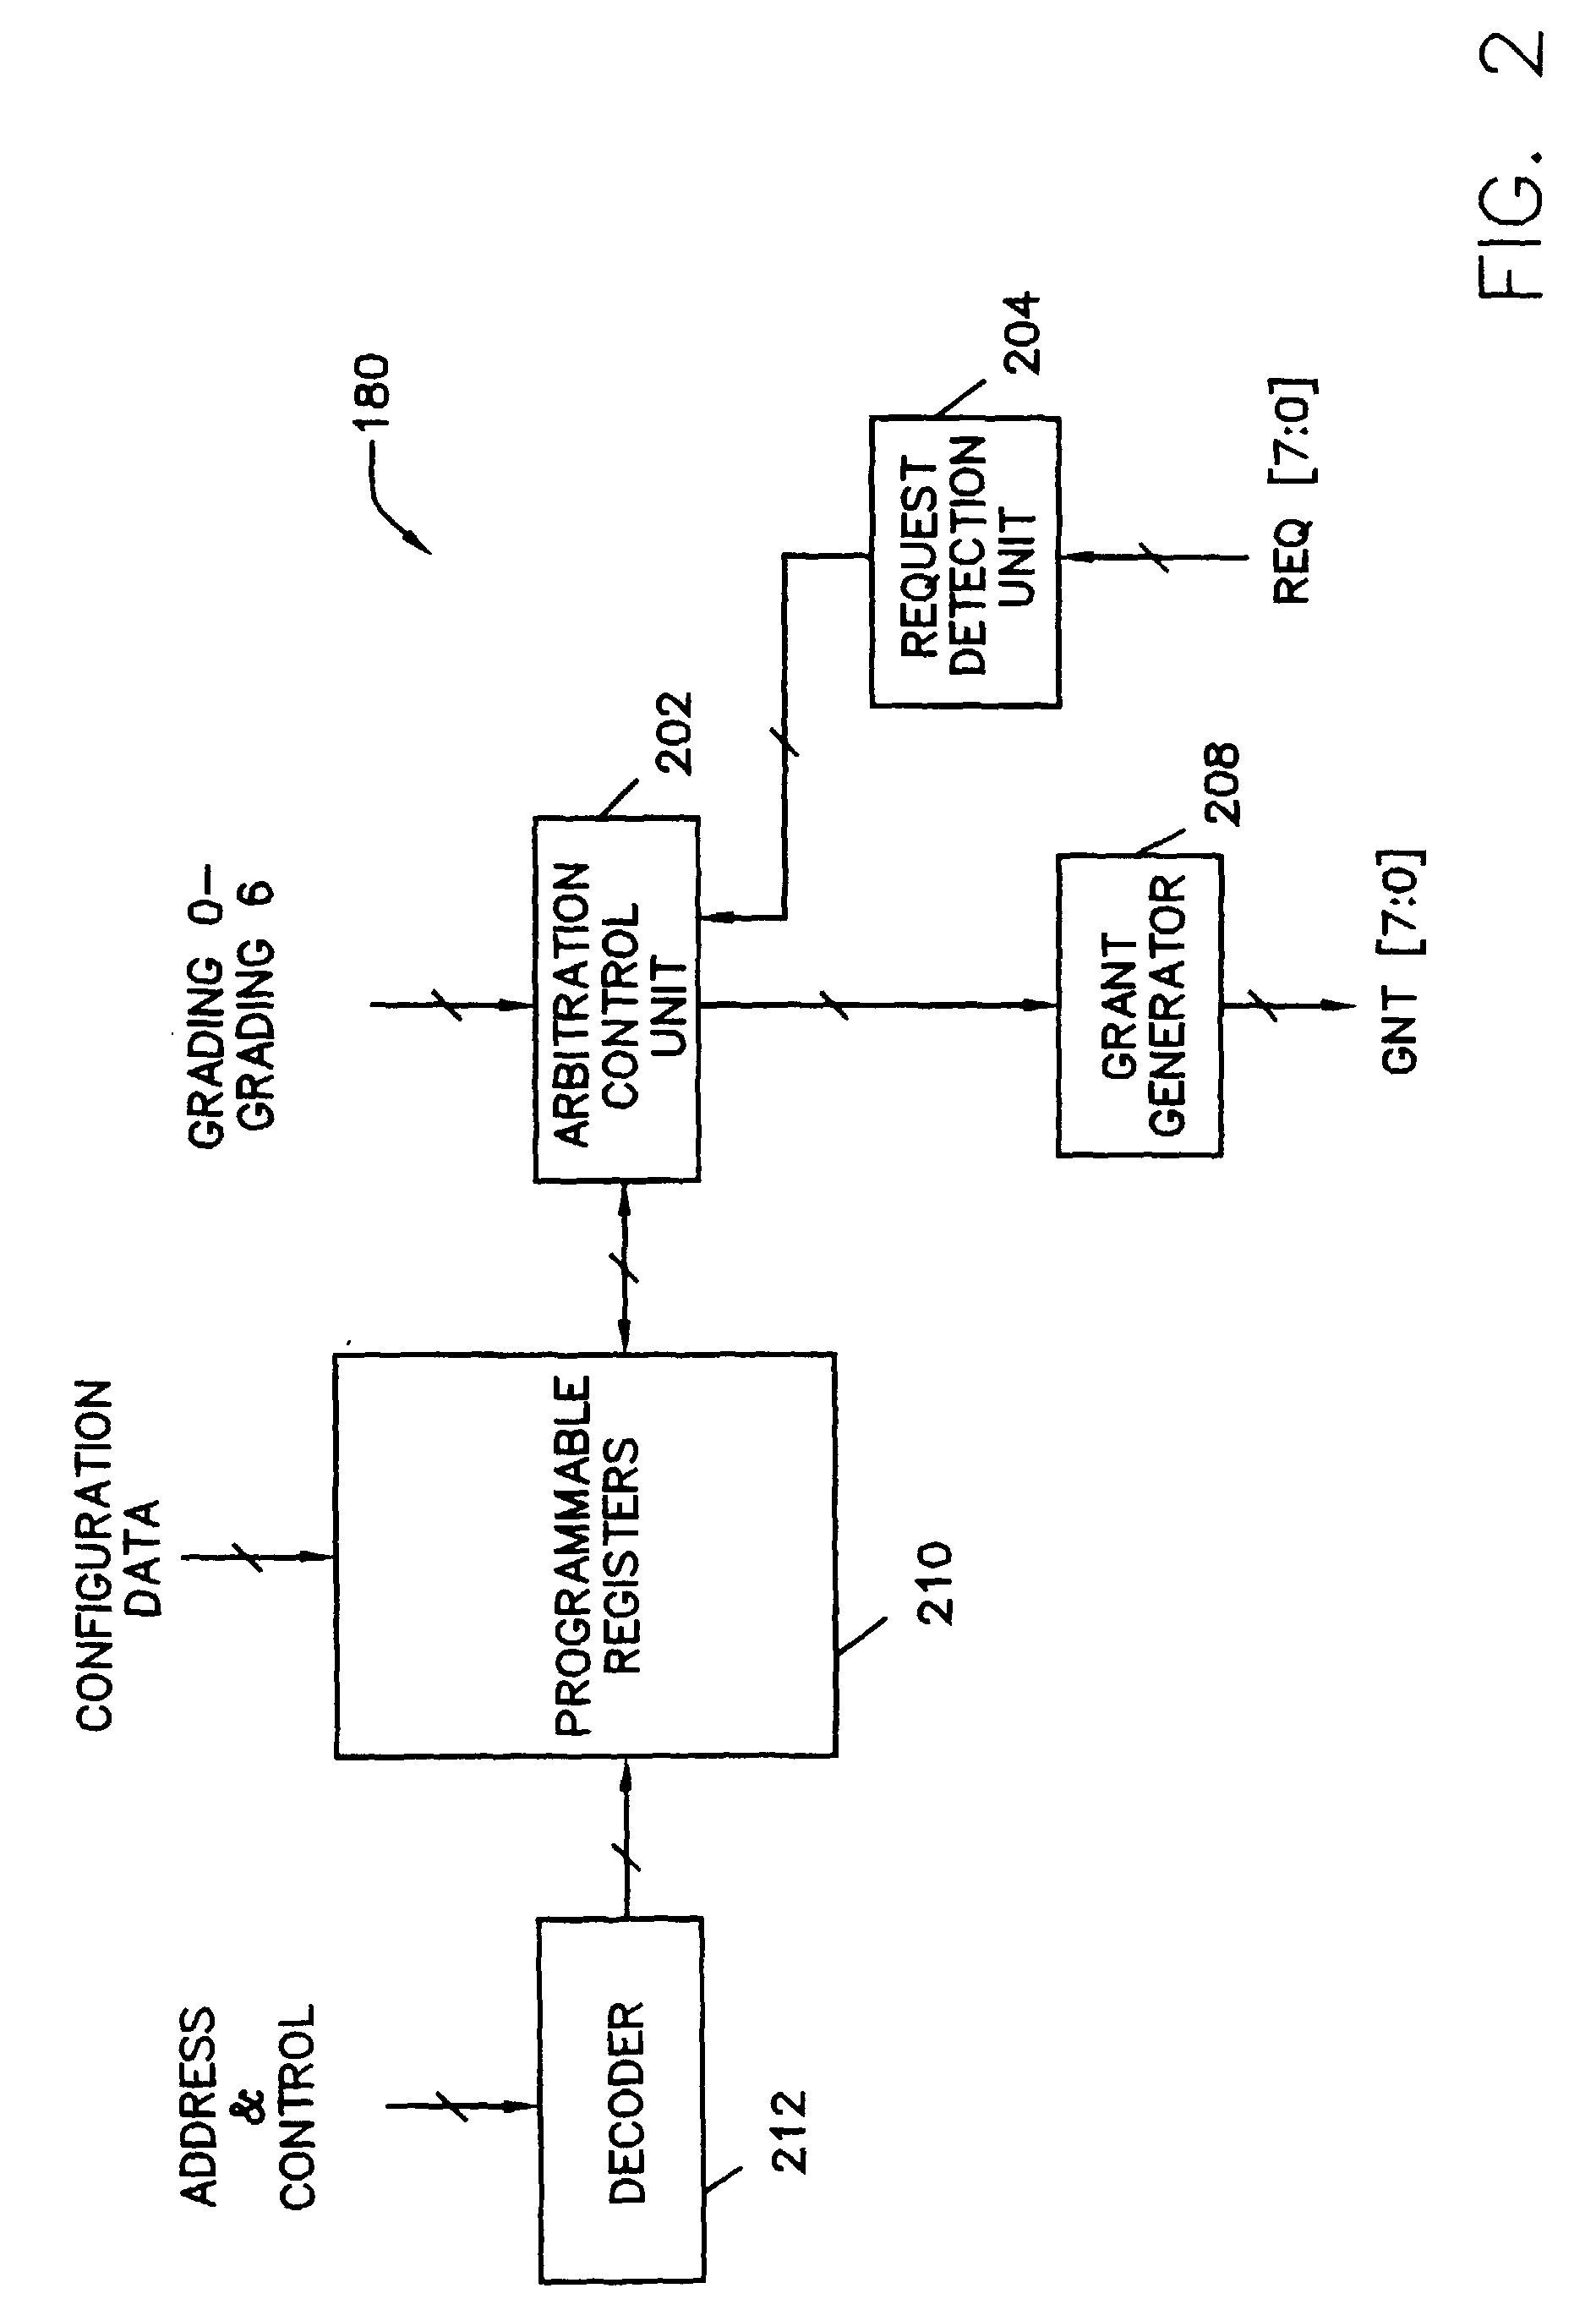 专利ep0890152b1 - bus arbiter employing a    to d